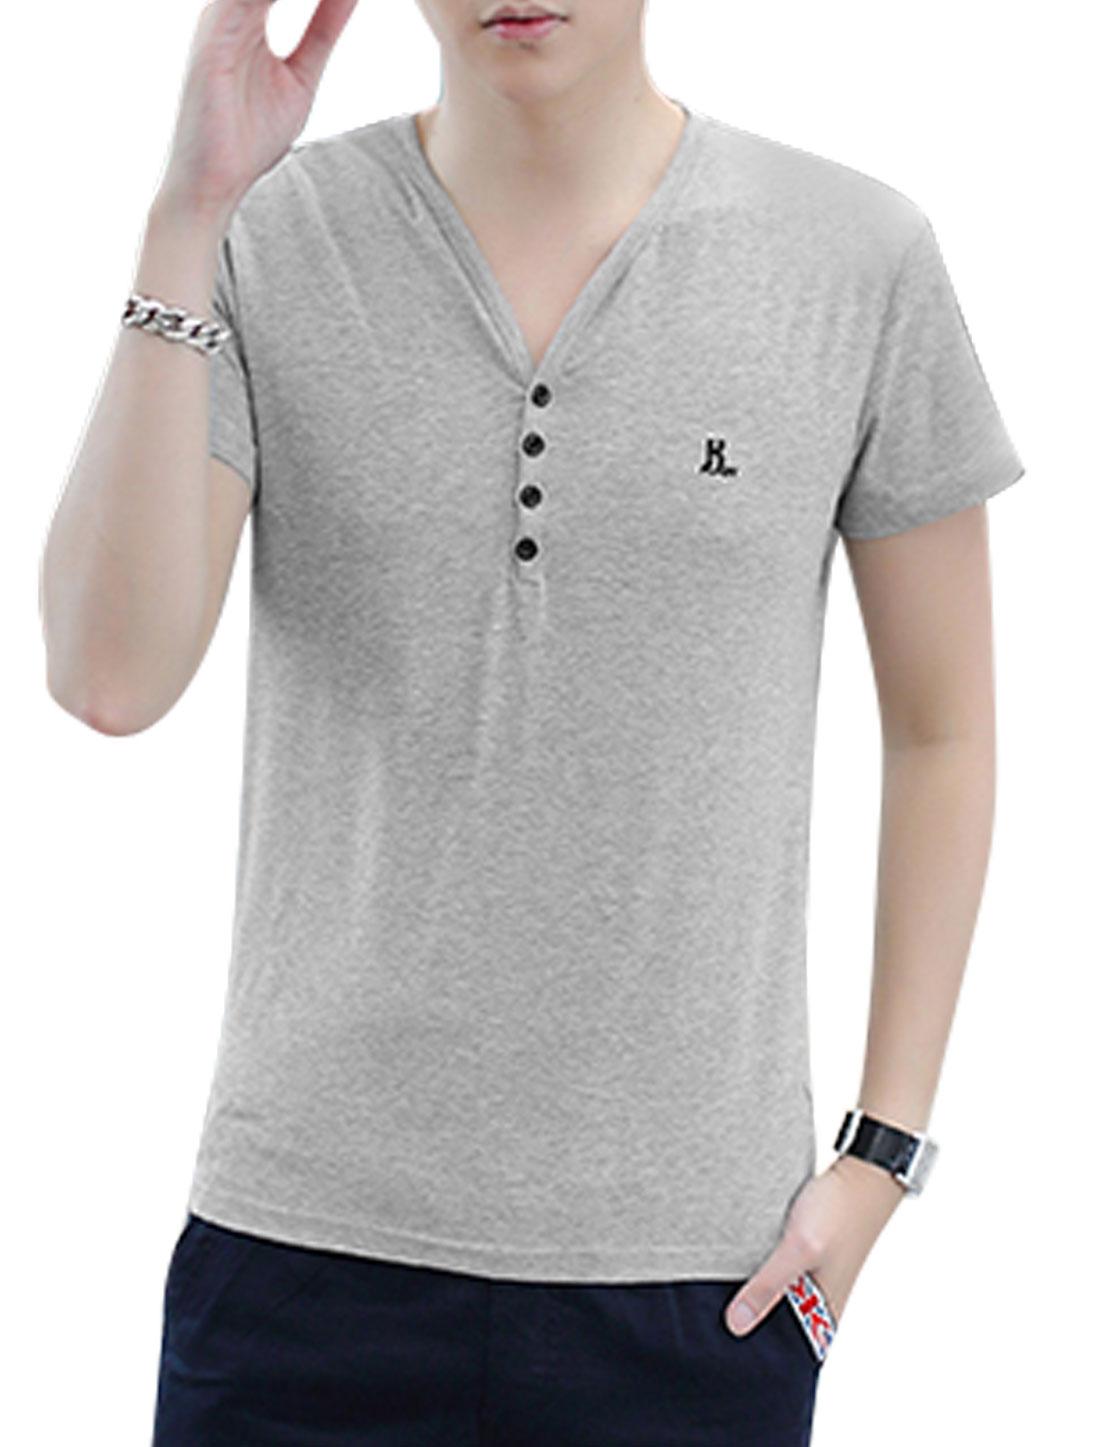 Men Short Sleeve V Neck Casual T-Shirt Light Gray M